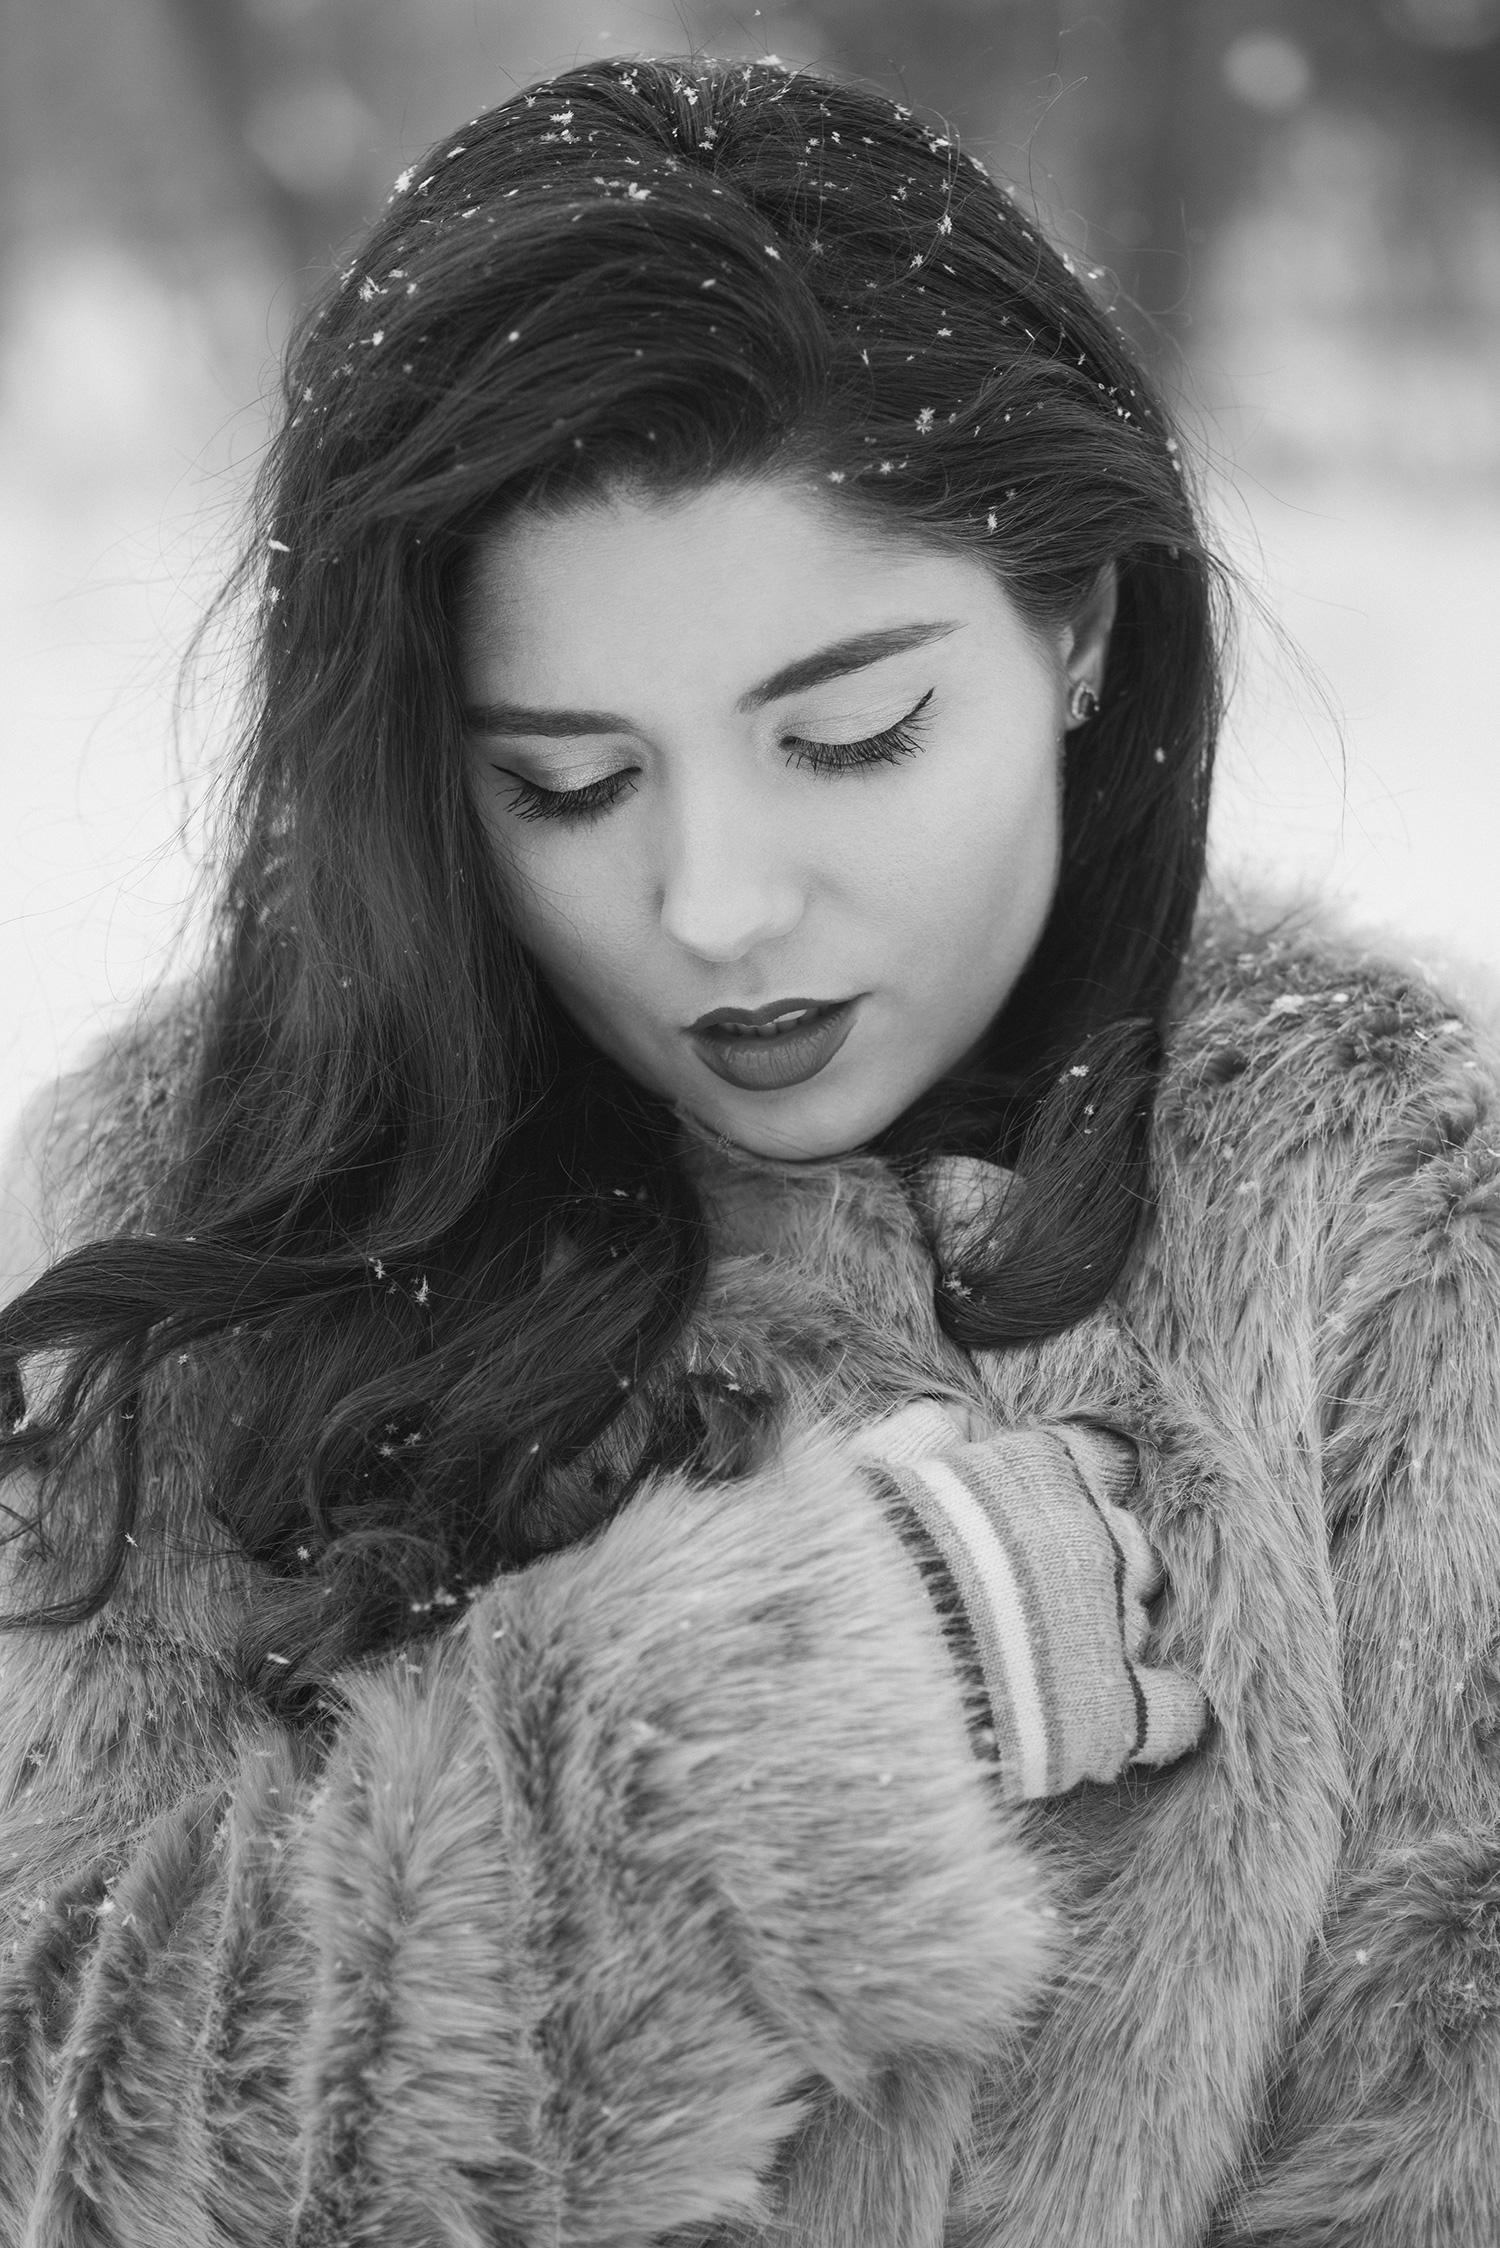 Fotografie alb-negru de portet cu mireasa in prim-plan care priveste inspre in jos in timp ce ninge